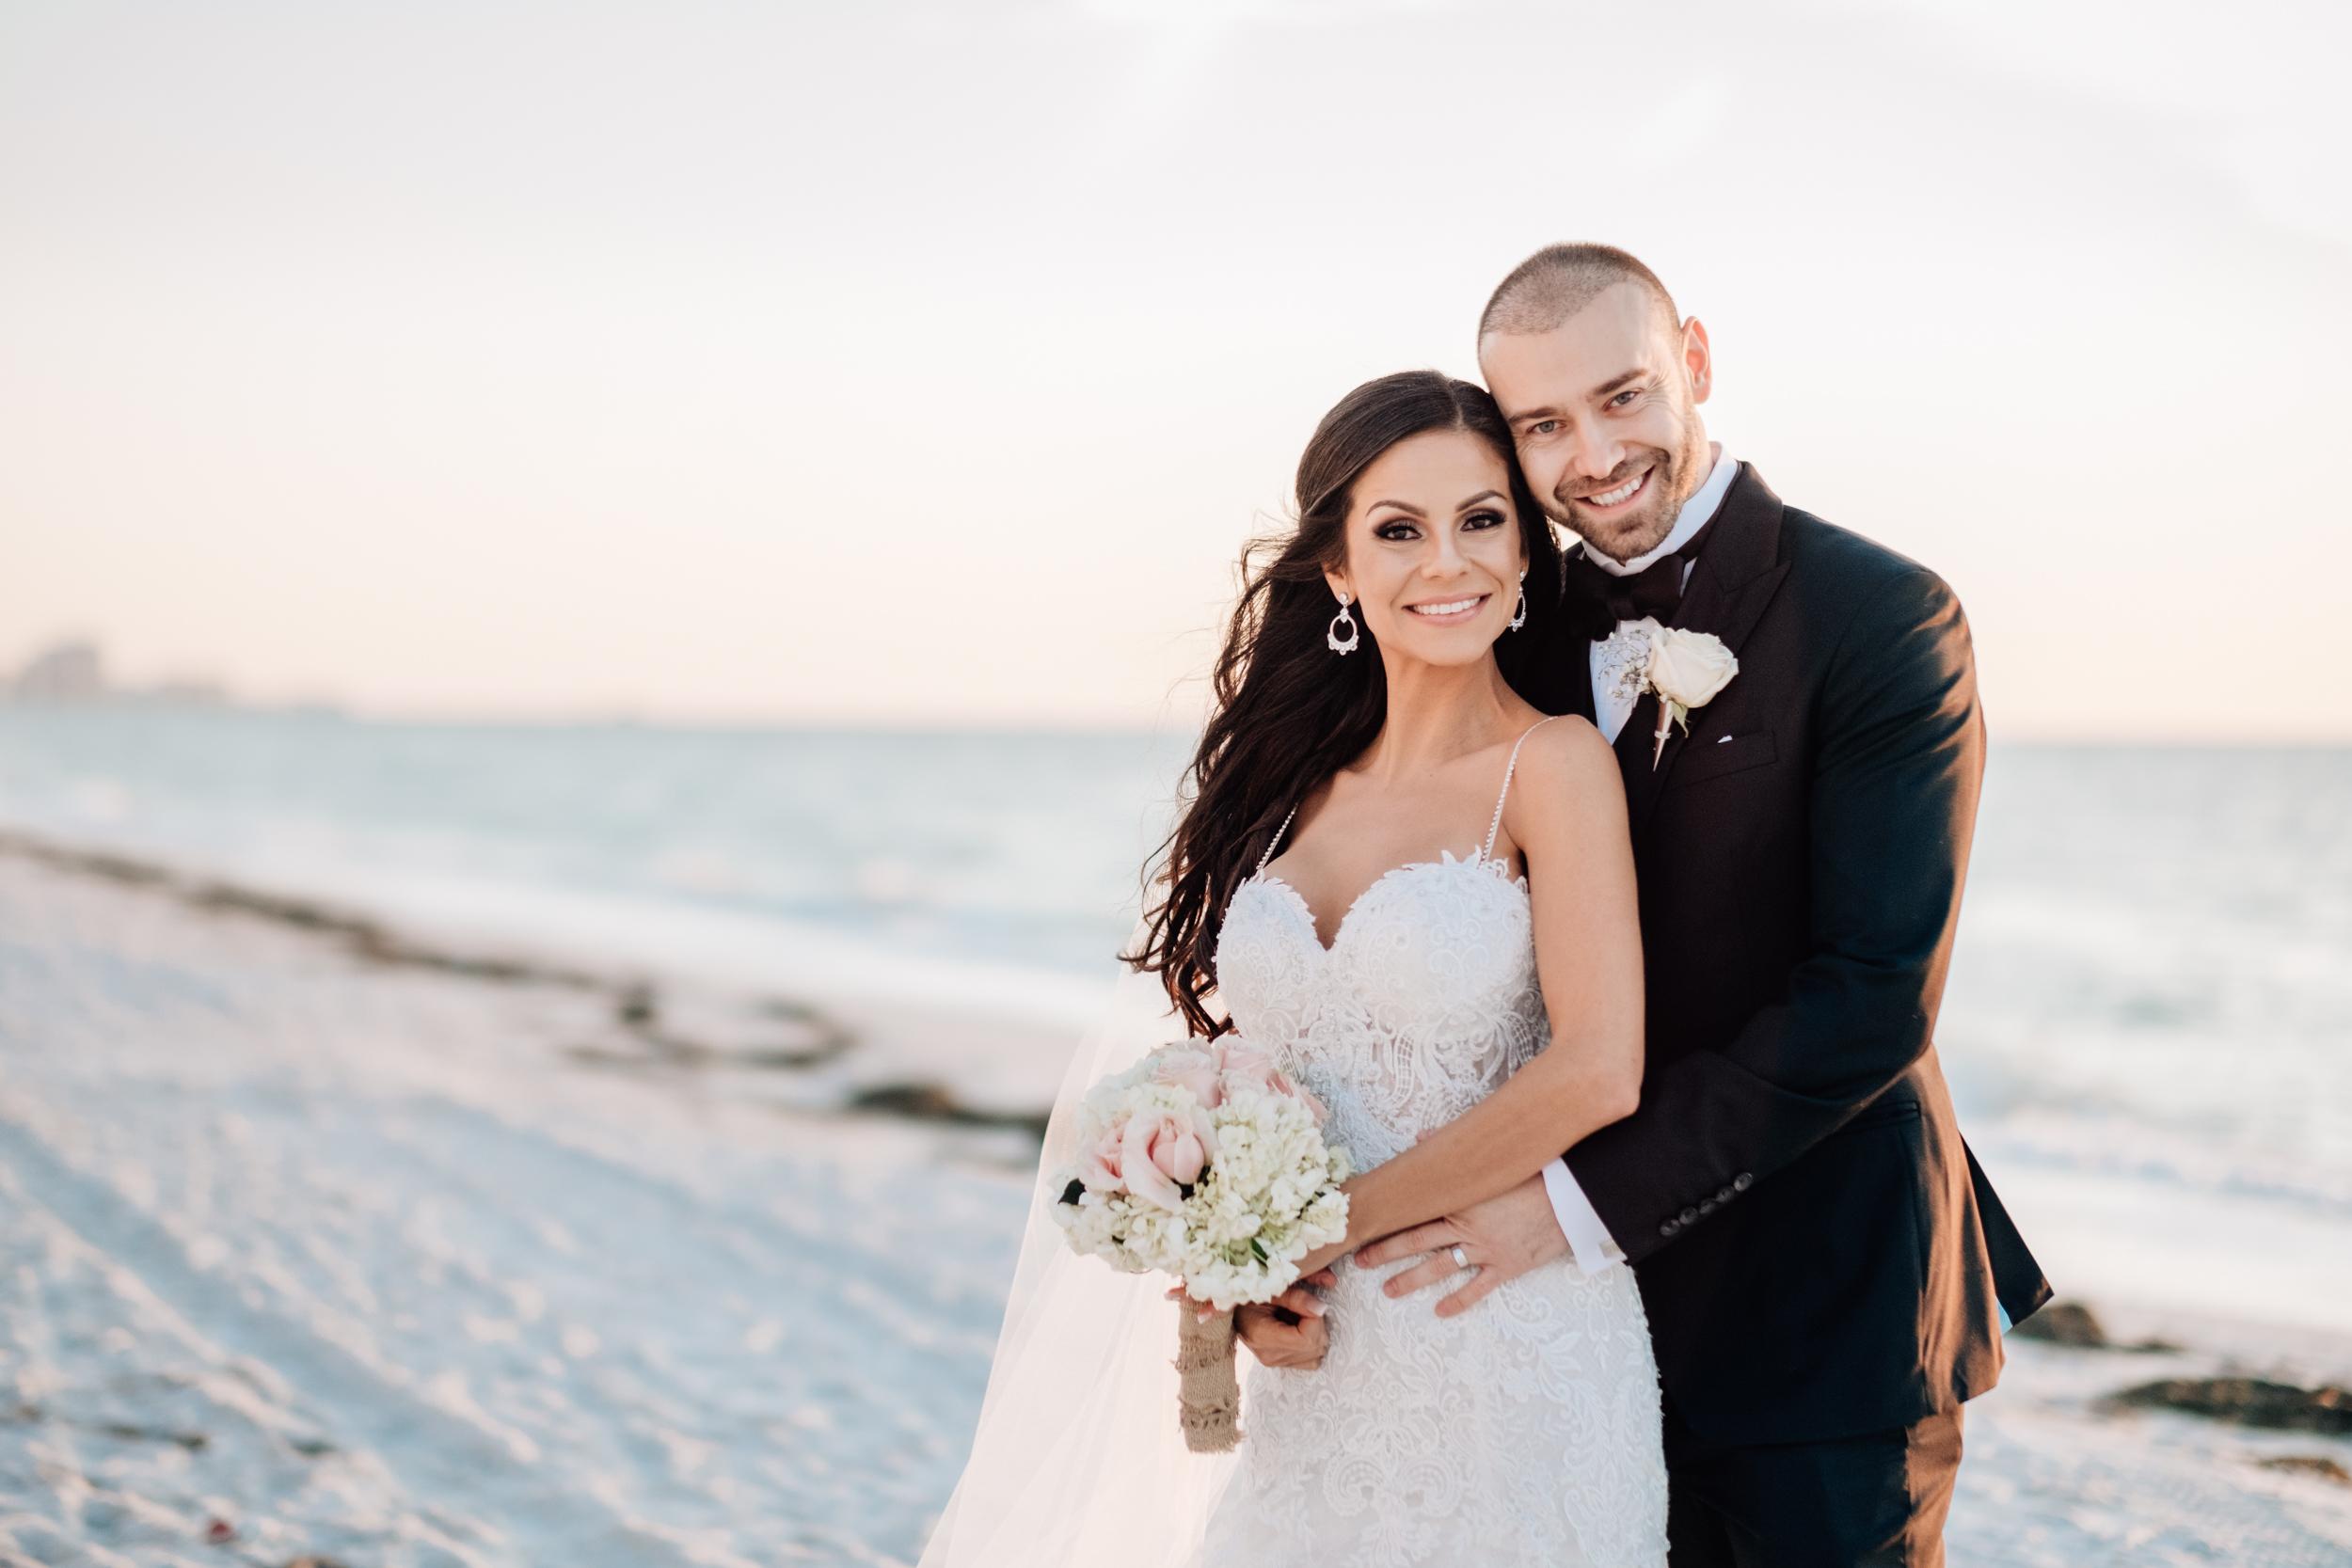 Amethyst Weddings - Georgi and Mariana 086.jpg